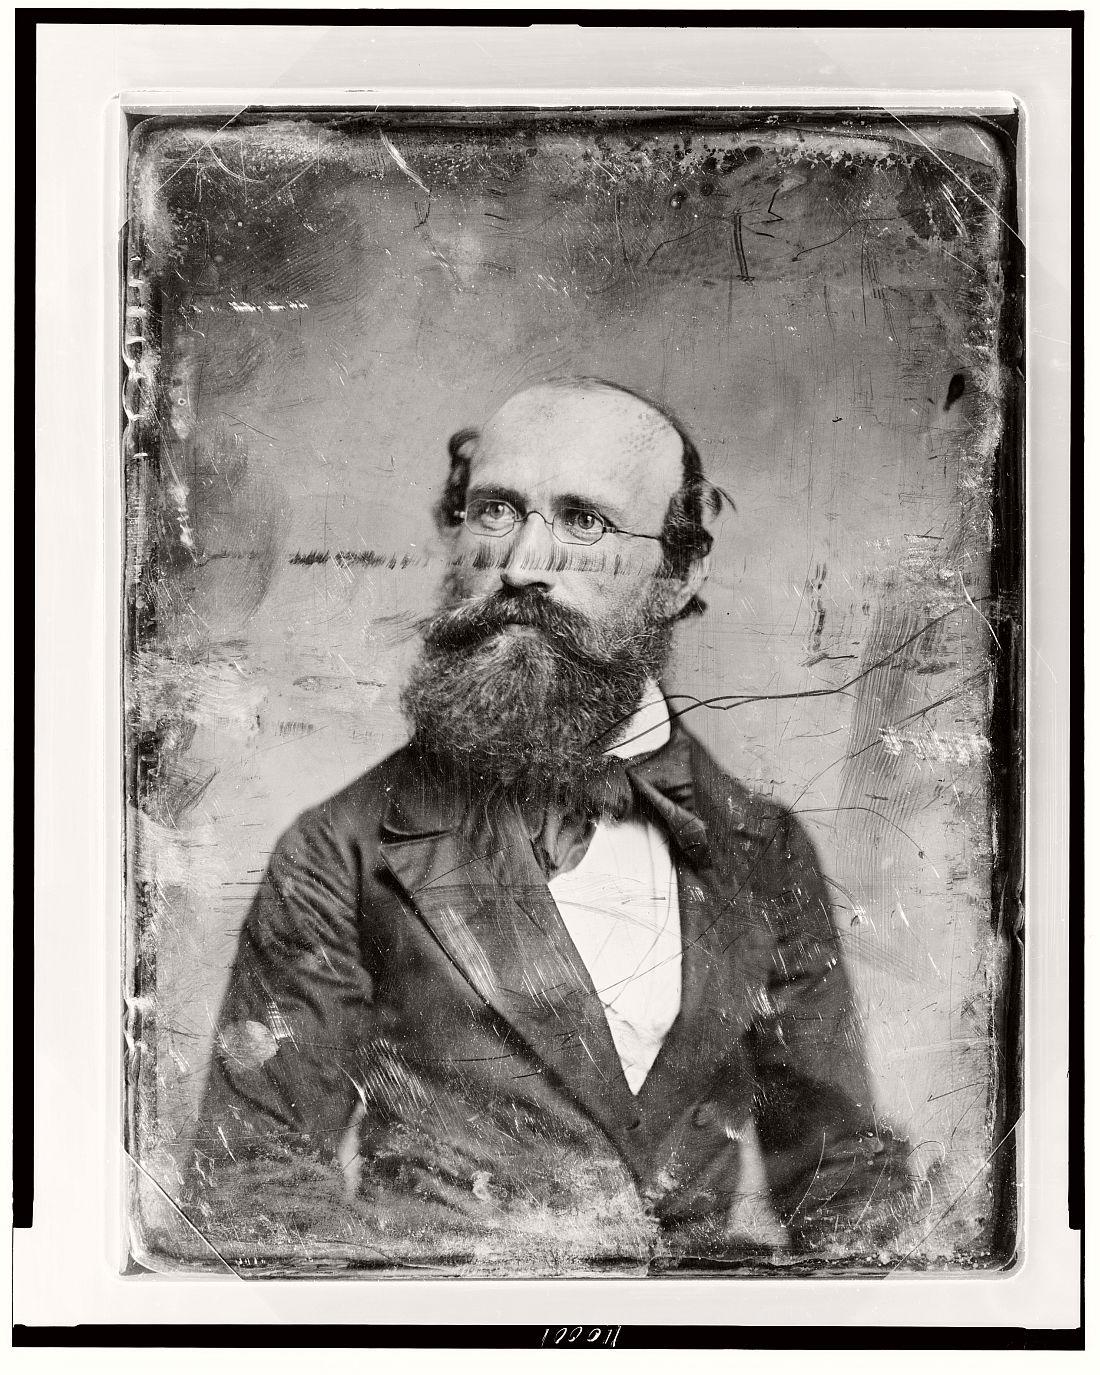 vintage-daguerreotype-portraits-from-xix-century-1844-1860-43